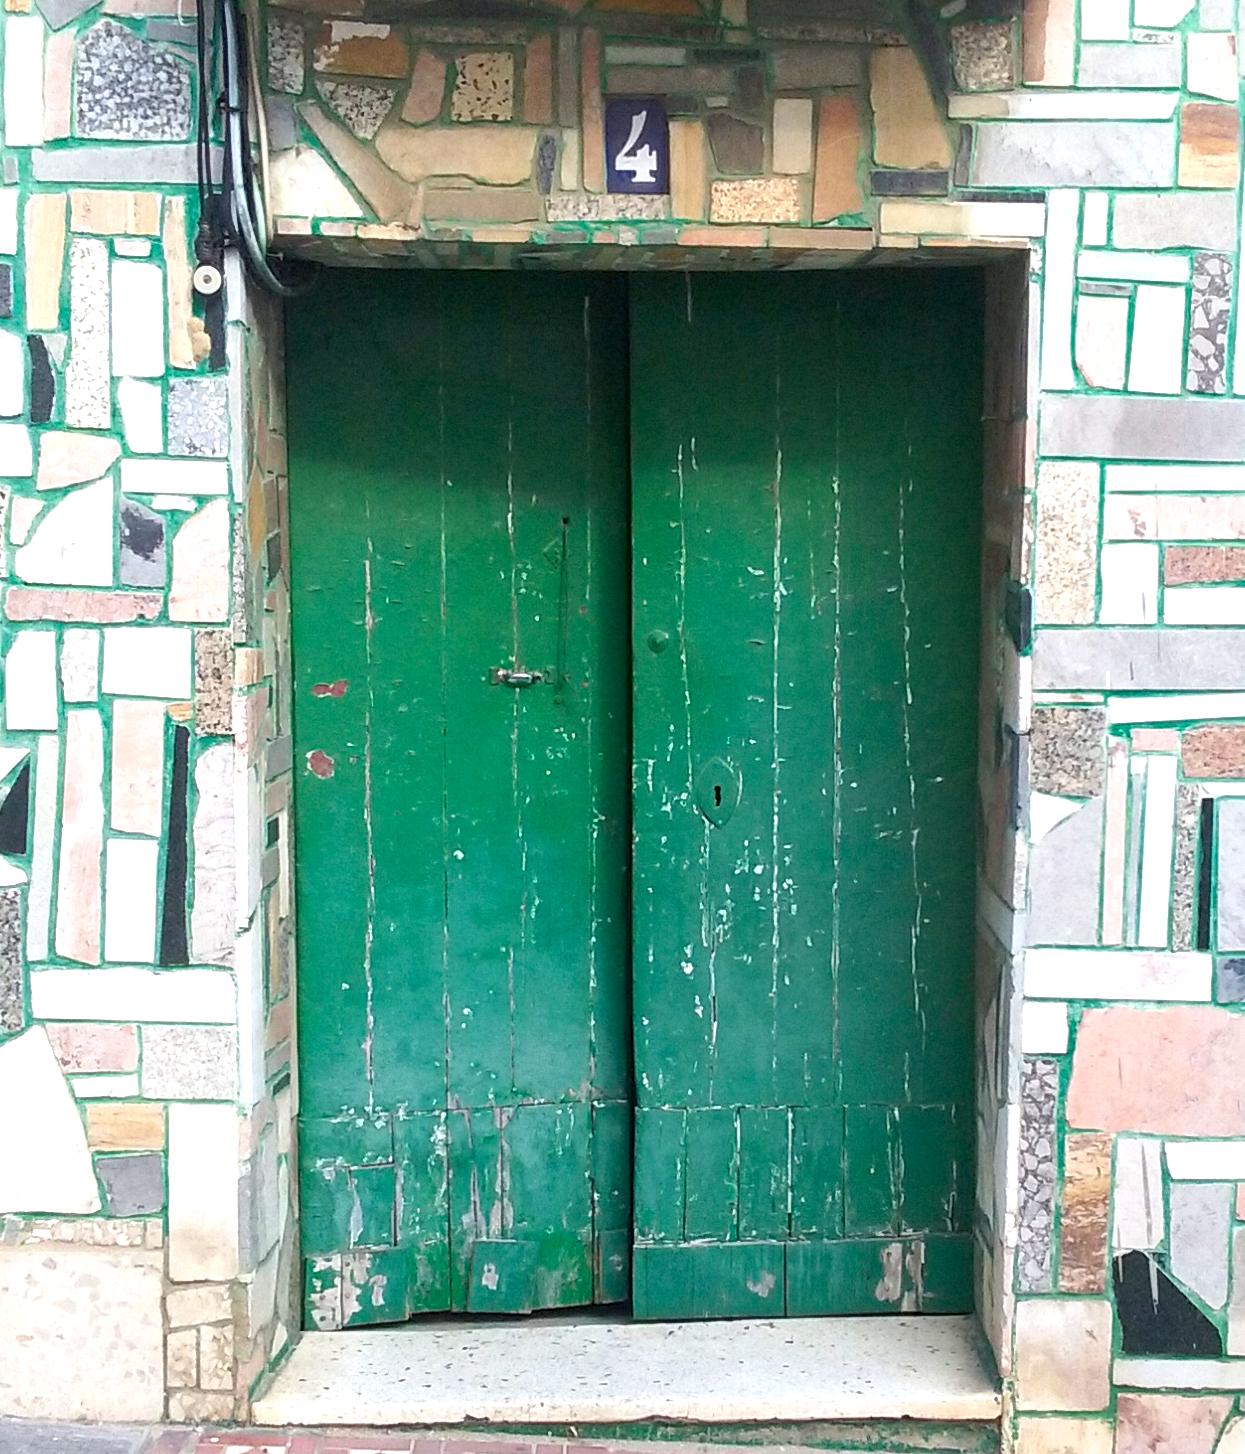 Tarifa cádiz street art doors and other interesting photos